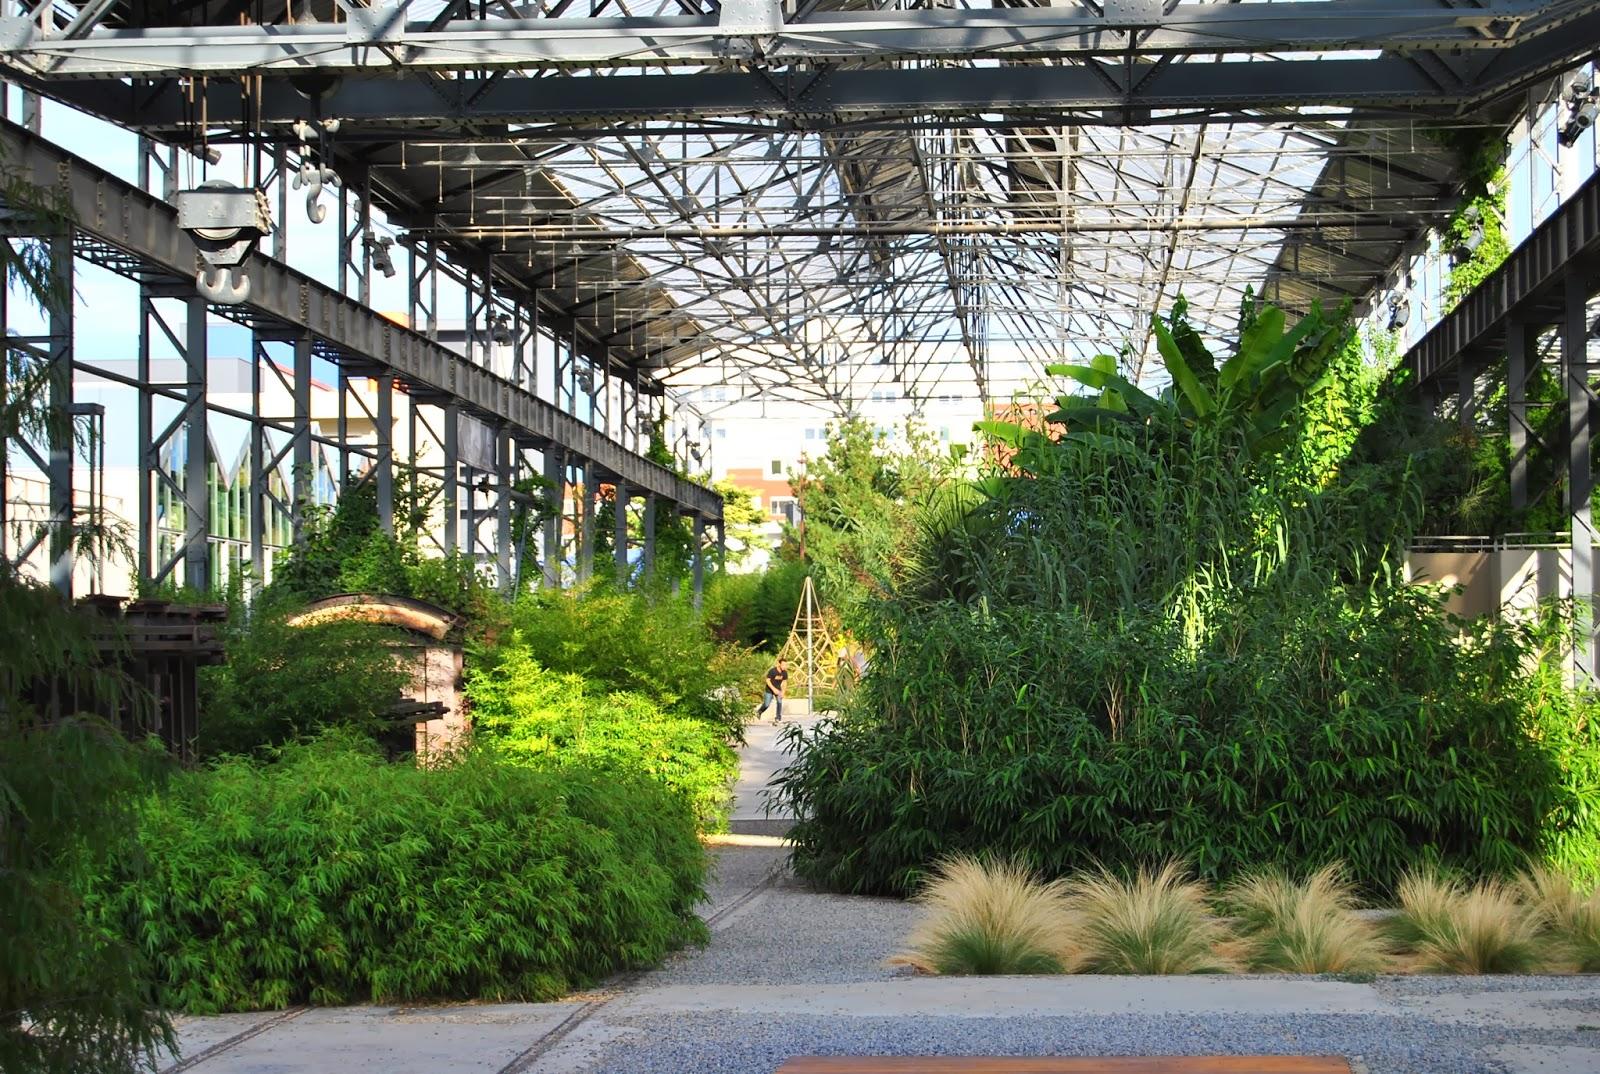 Paradis express jardin des fonderies nantes for Jardin nantes